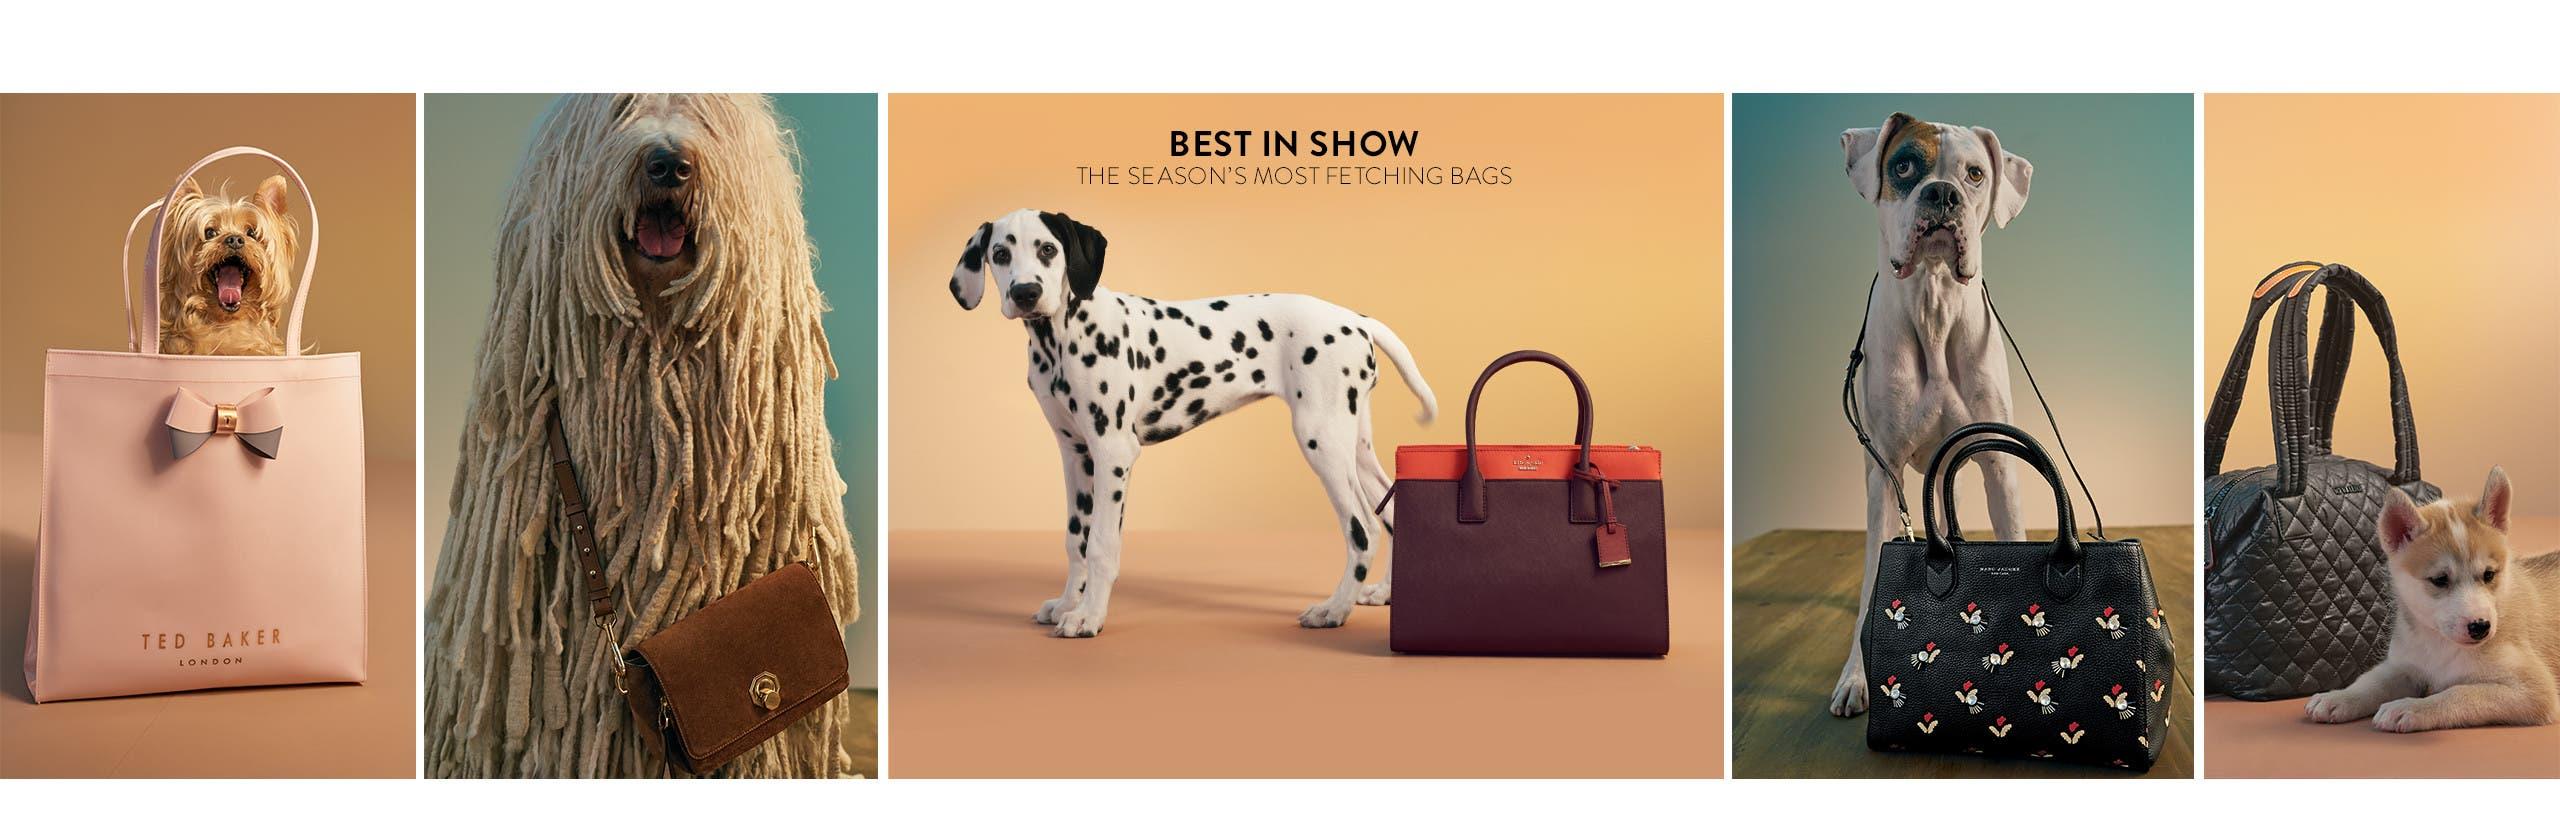 Best in show: national handbag day.